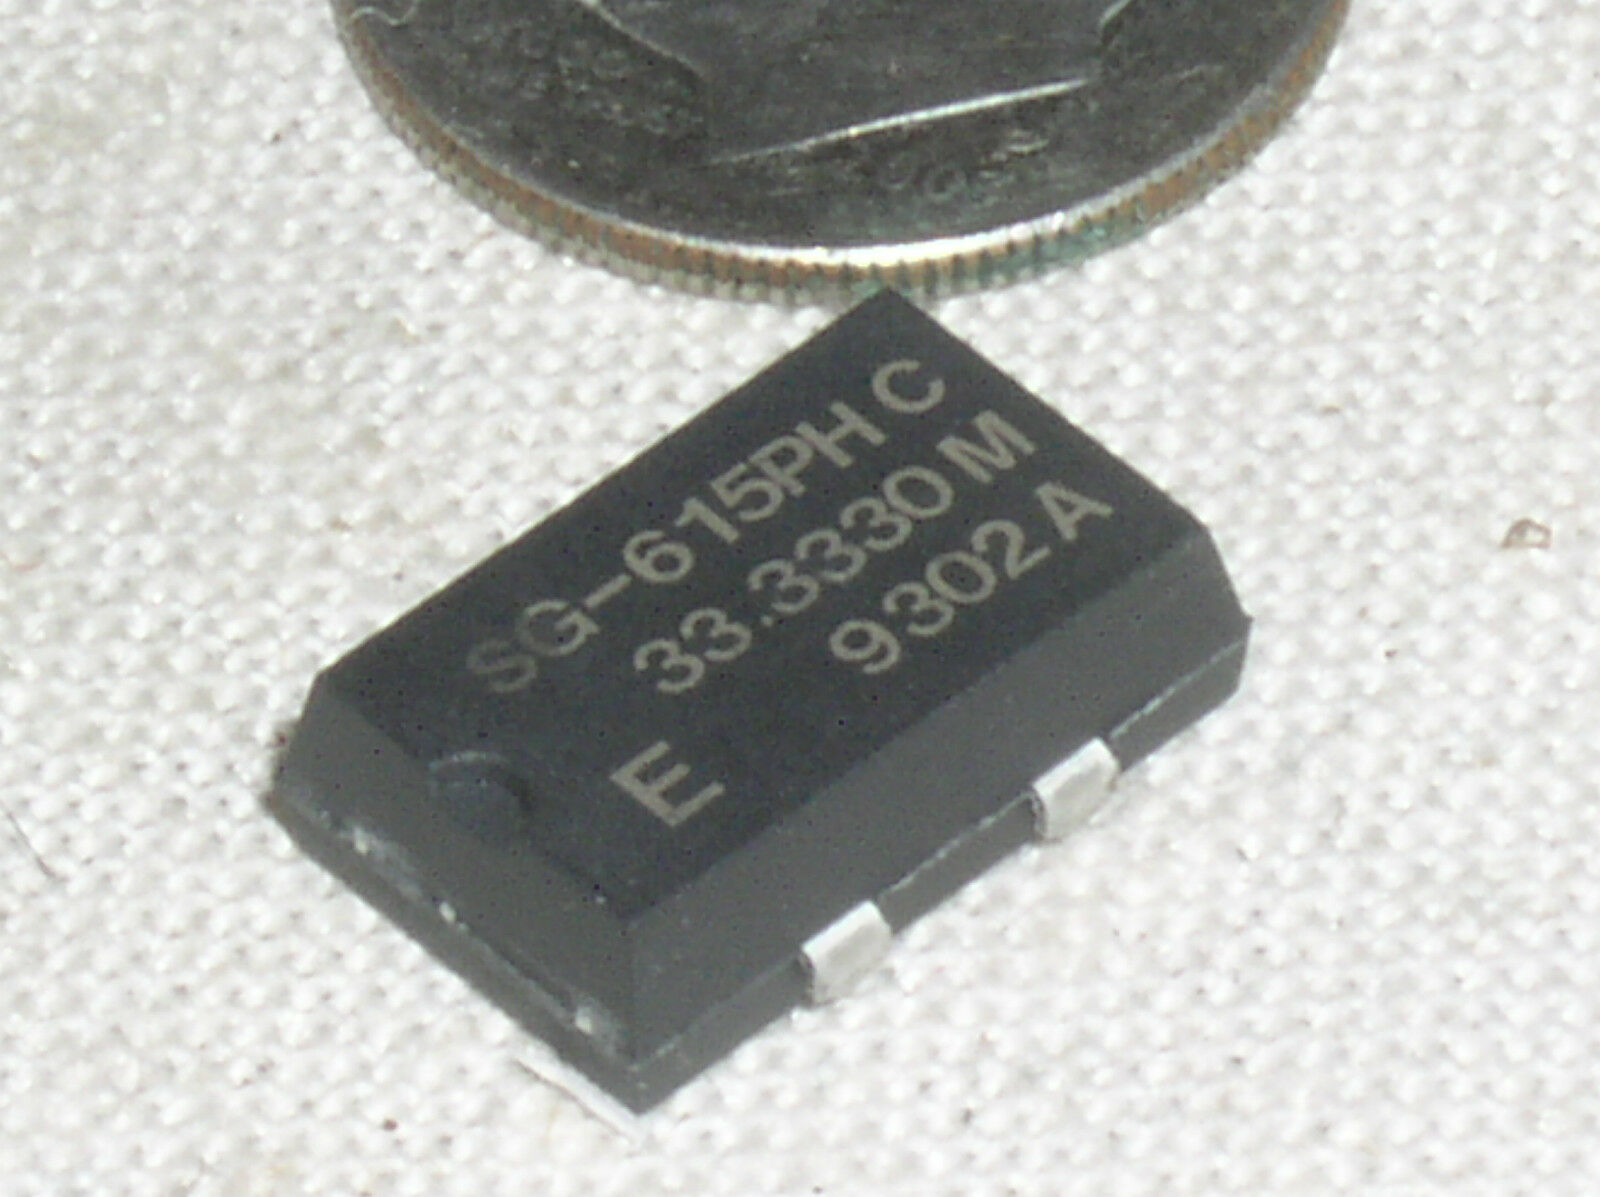 SMD LOT of 10PCS SEIKO SG-615P 1.544MHZ C CRYSTAL OSC 1.544MHz HCMOS